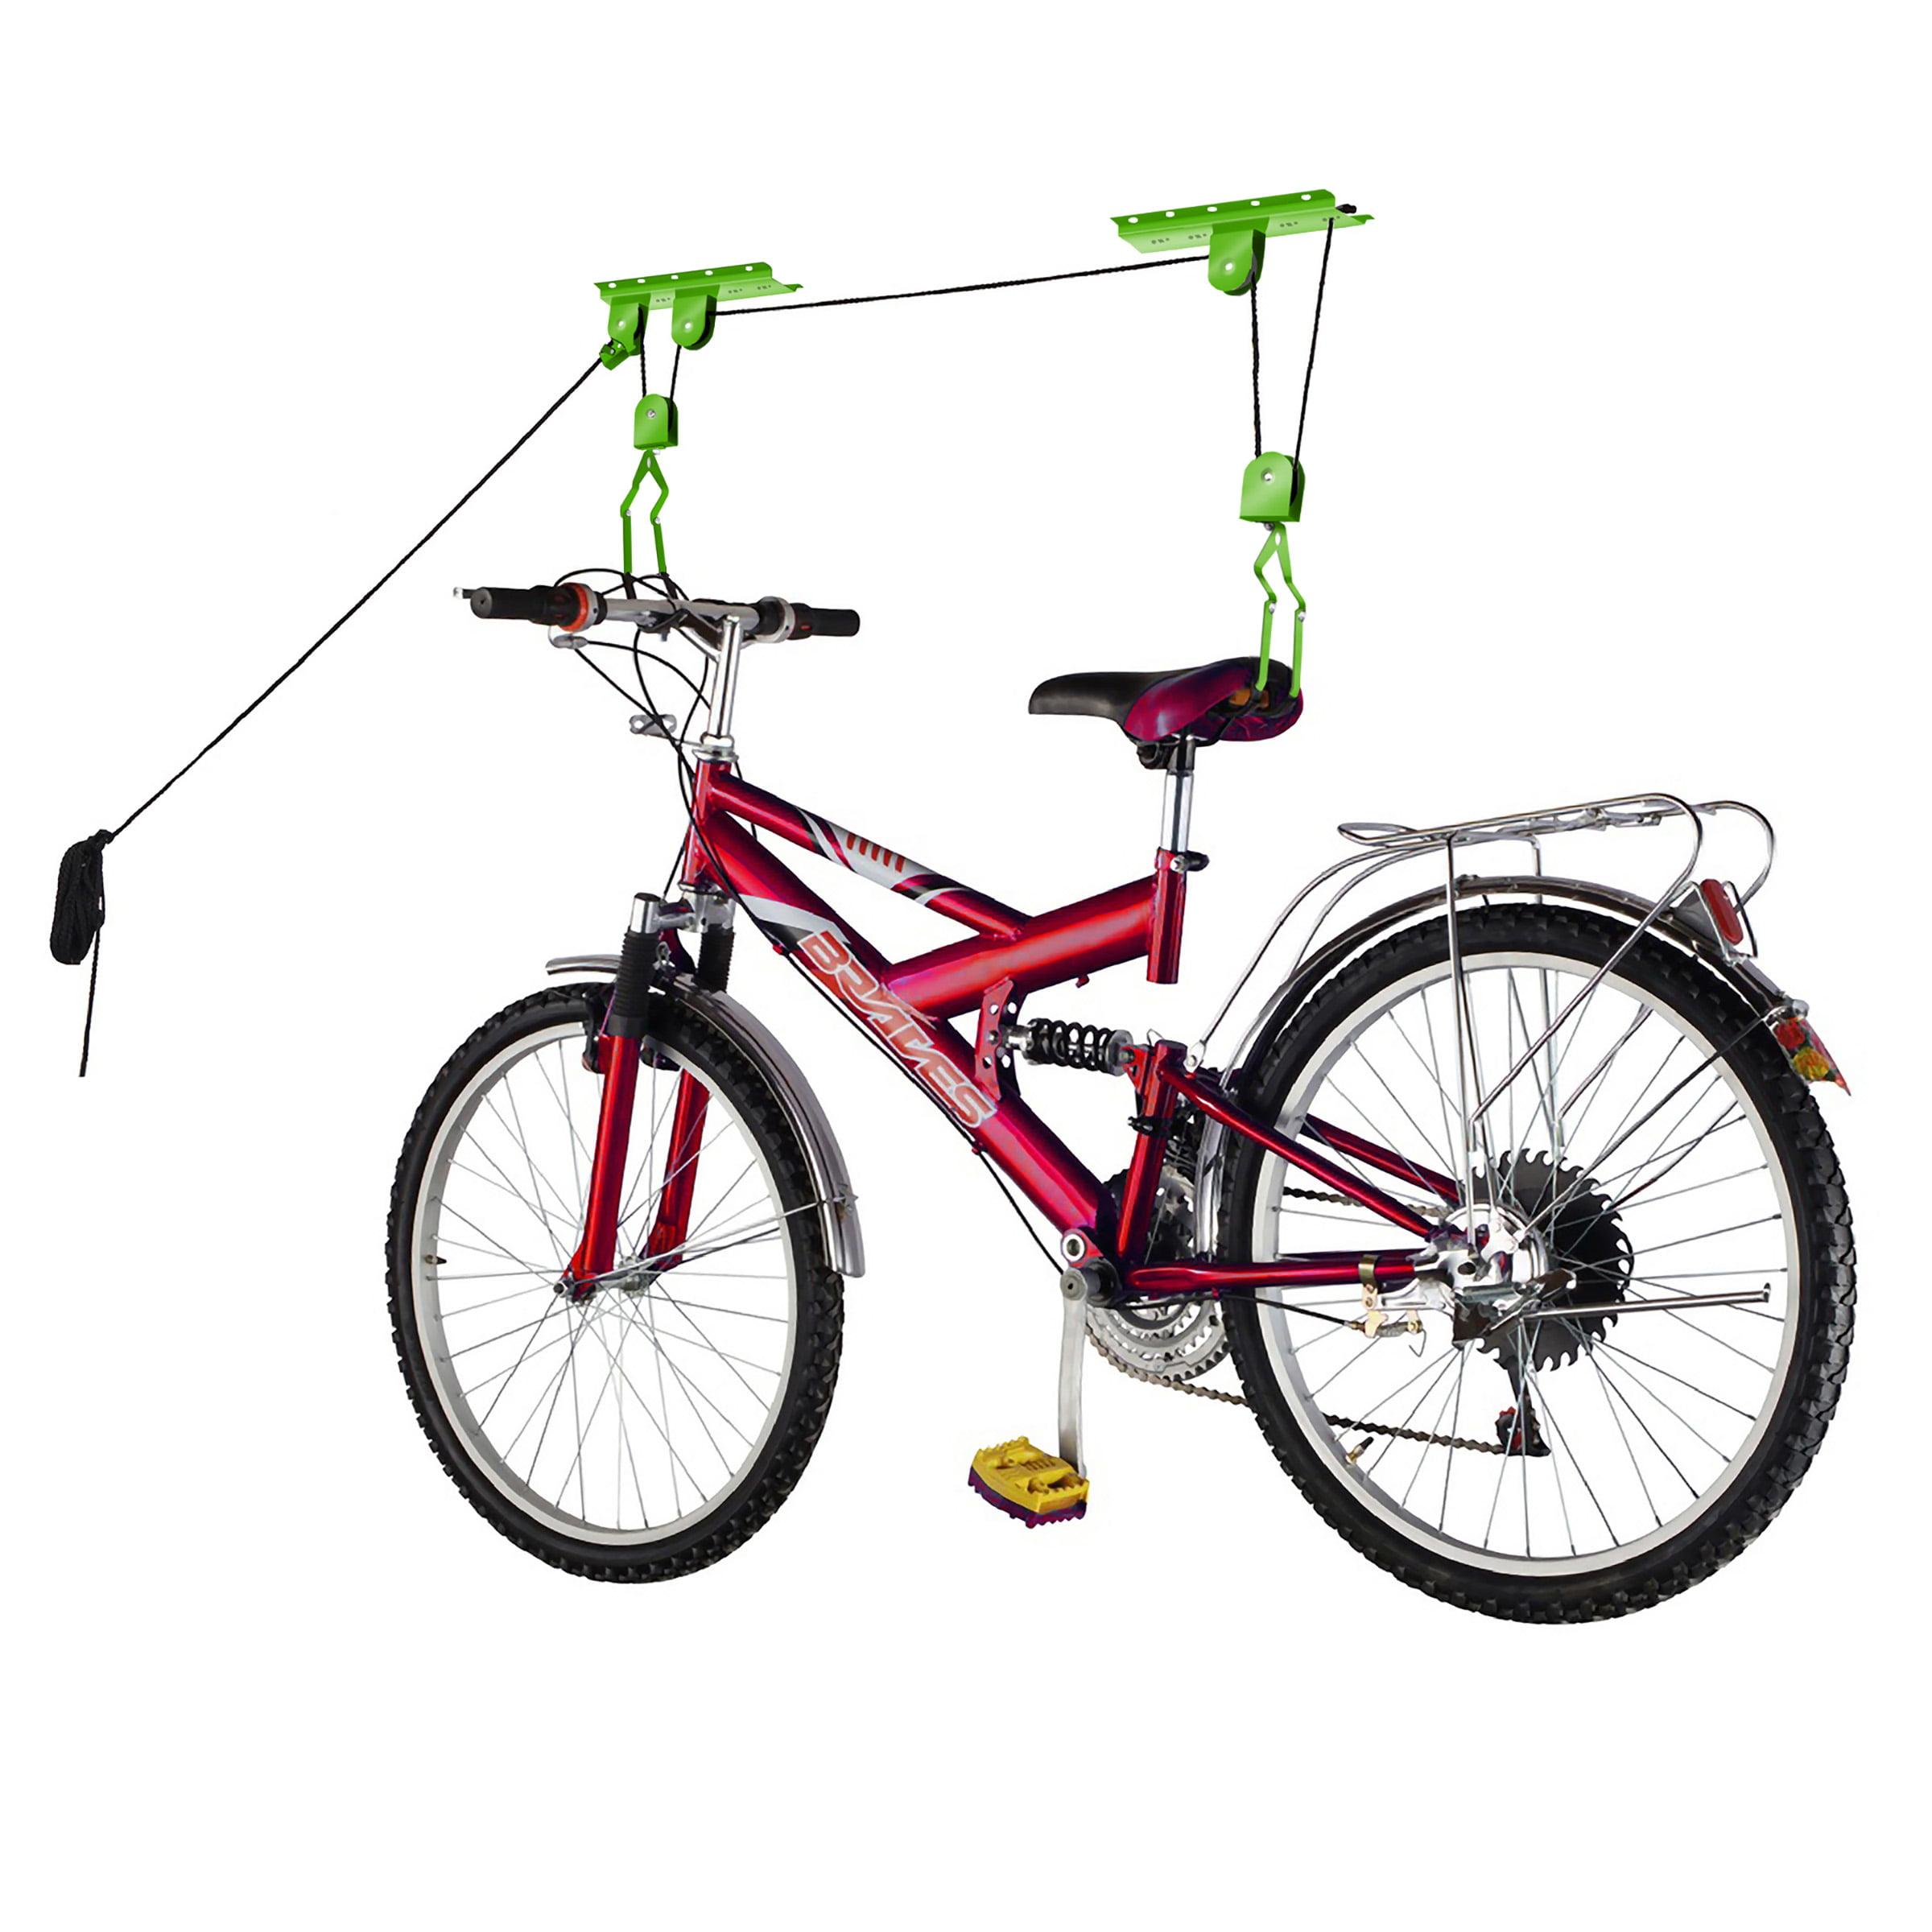 2009 Bike Lane Bicycle Garage Storage Lift Bike Hoist 100LB Capacity Heavy Duty